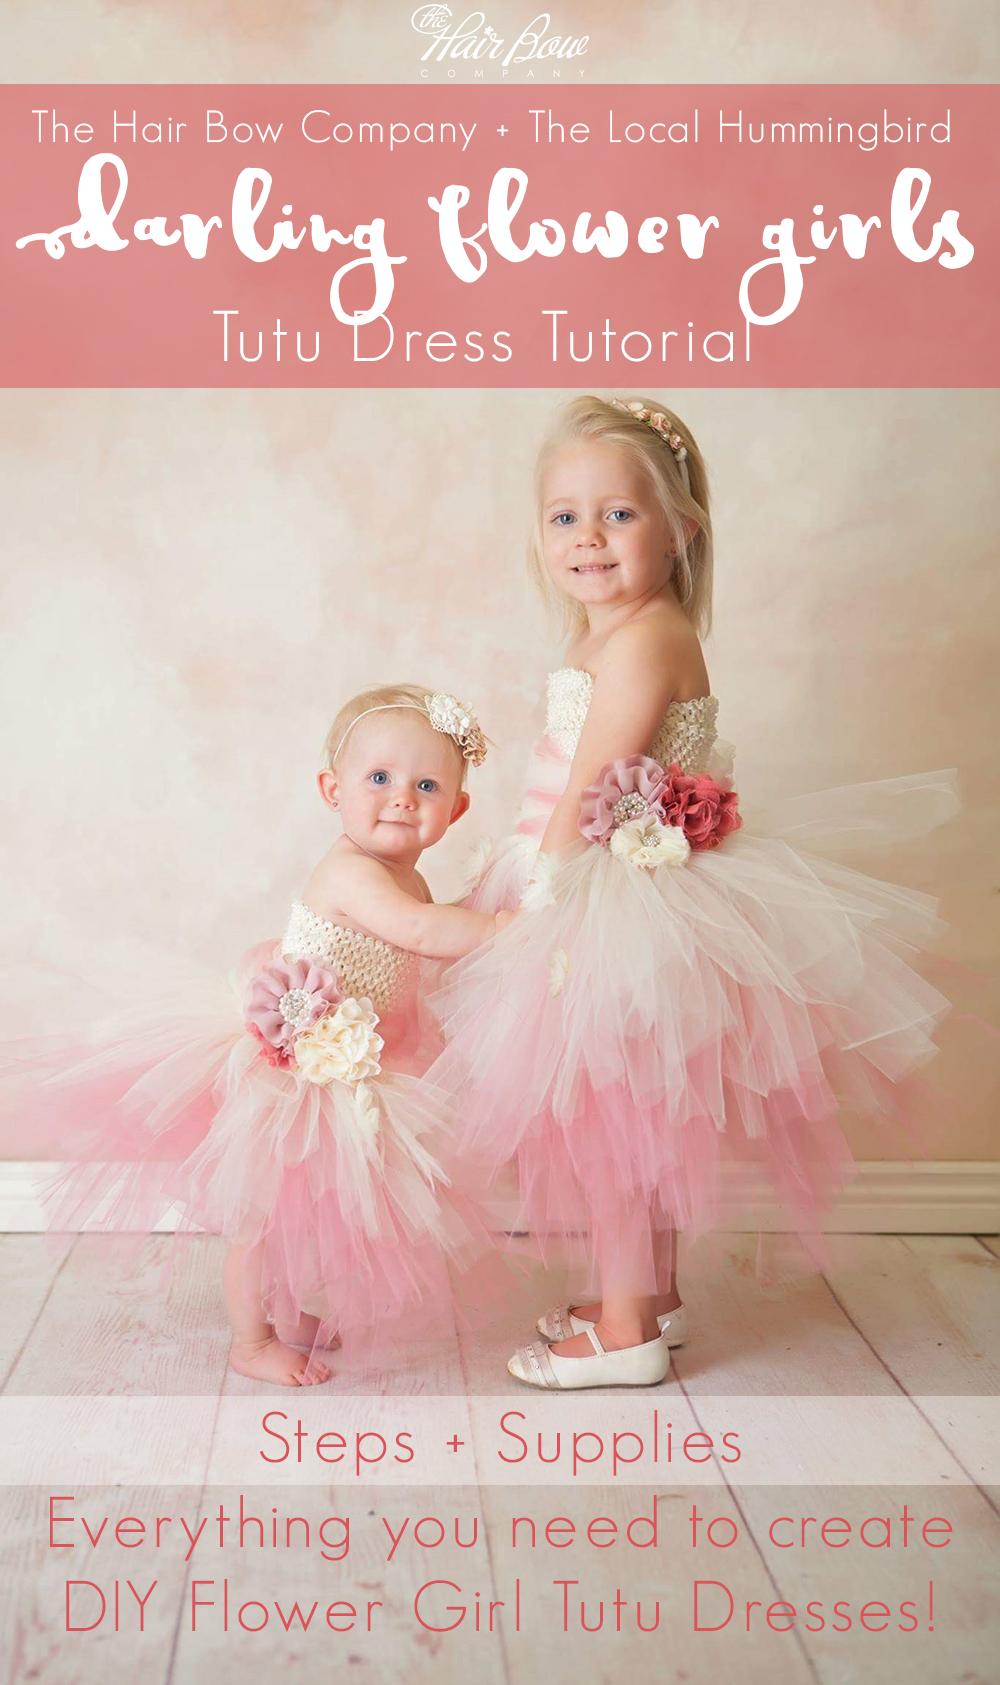 c9e48d744 Darling Flower Girl Tutu Dress DIY Tutorial - The Hair Bow Company ...